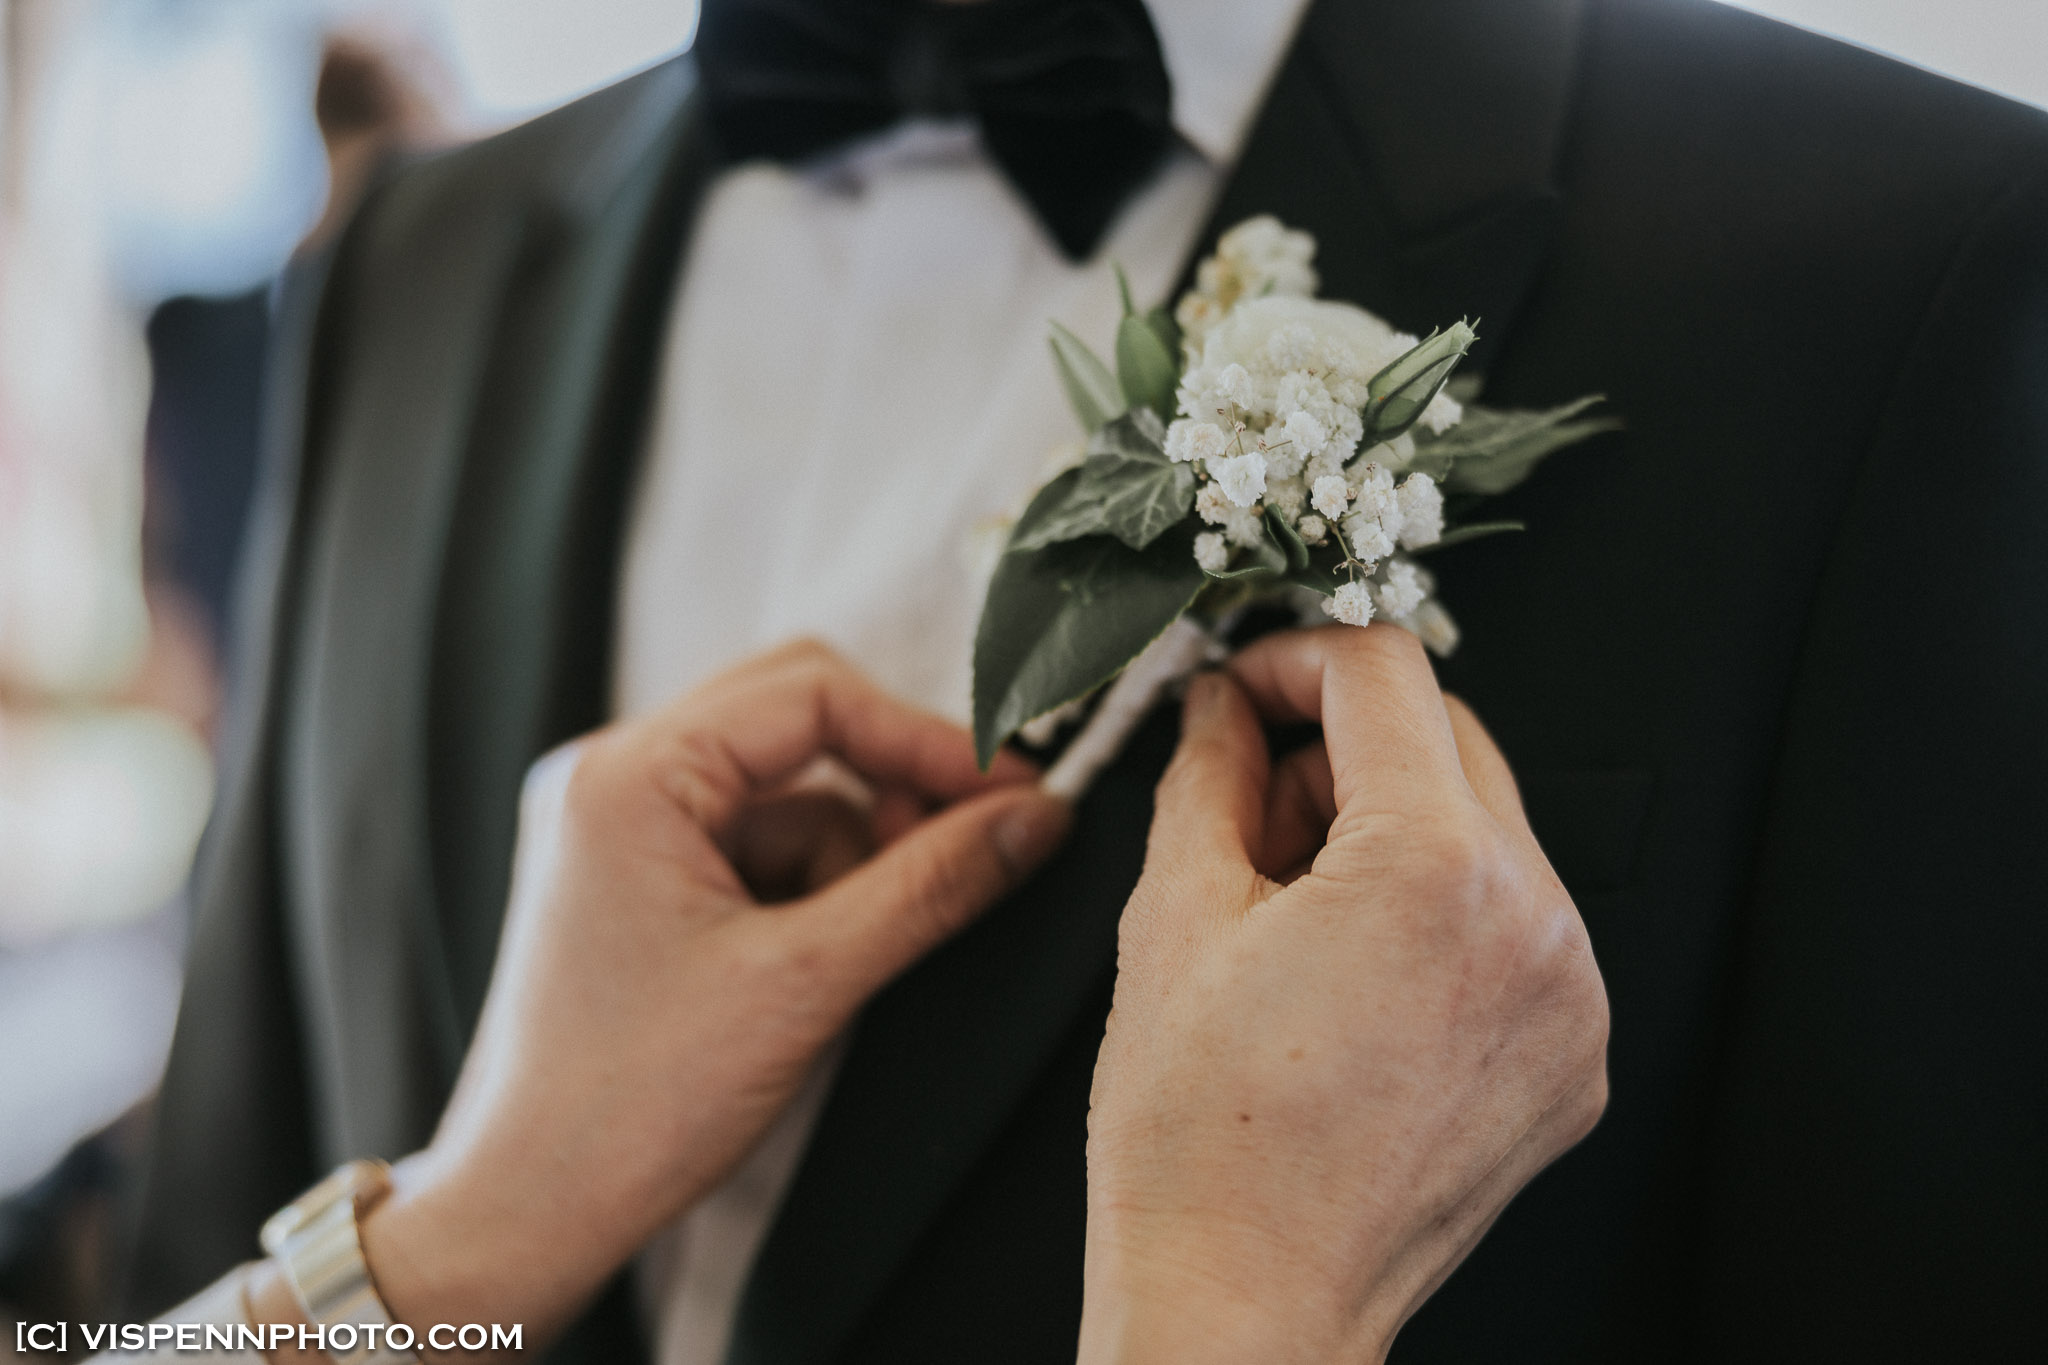 WEDDING DAY Photography Melbourne LeanneWesley 01314 1P EOSR ZHPENN